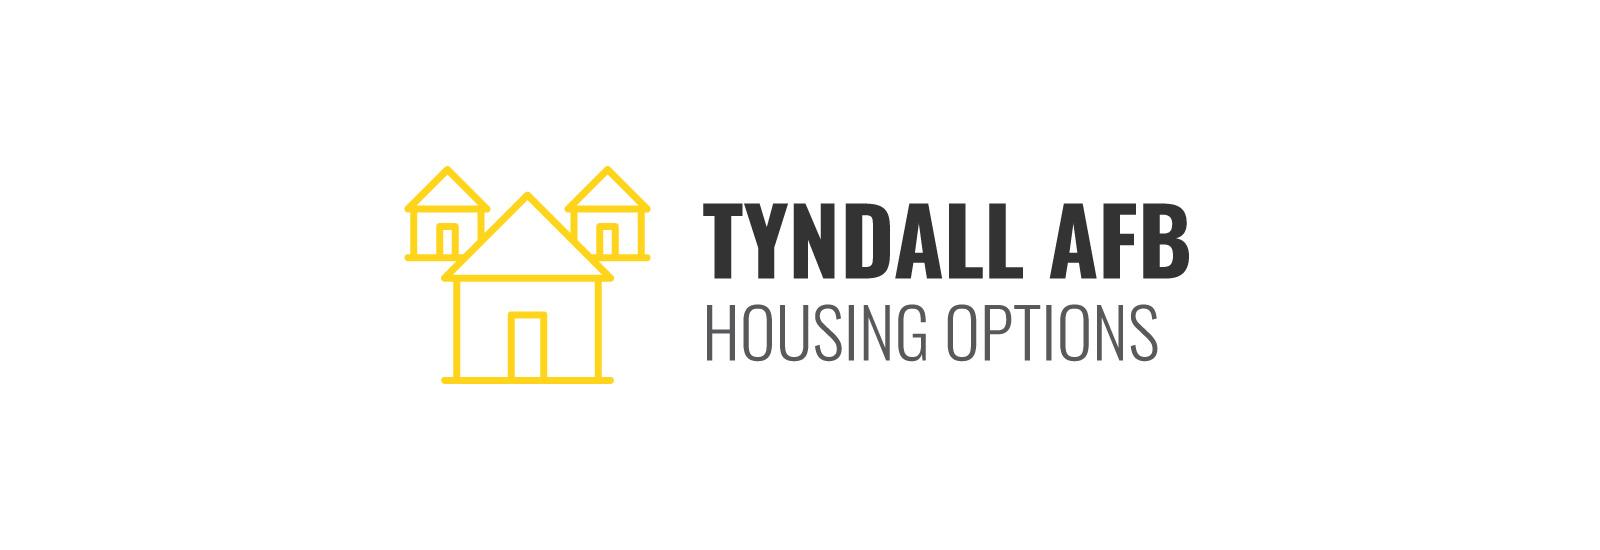 Tyndall AFB Housing Options